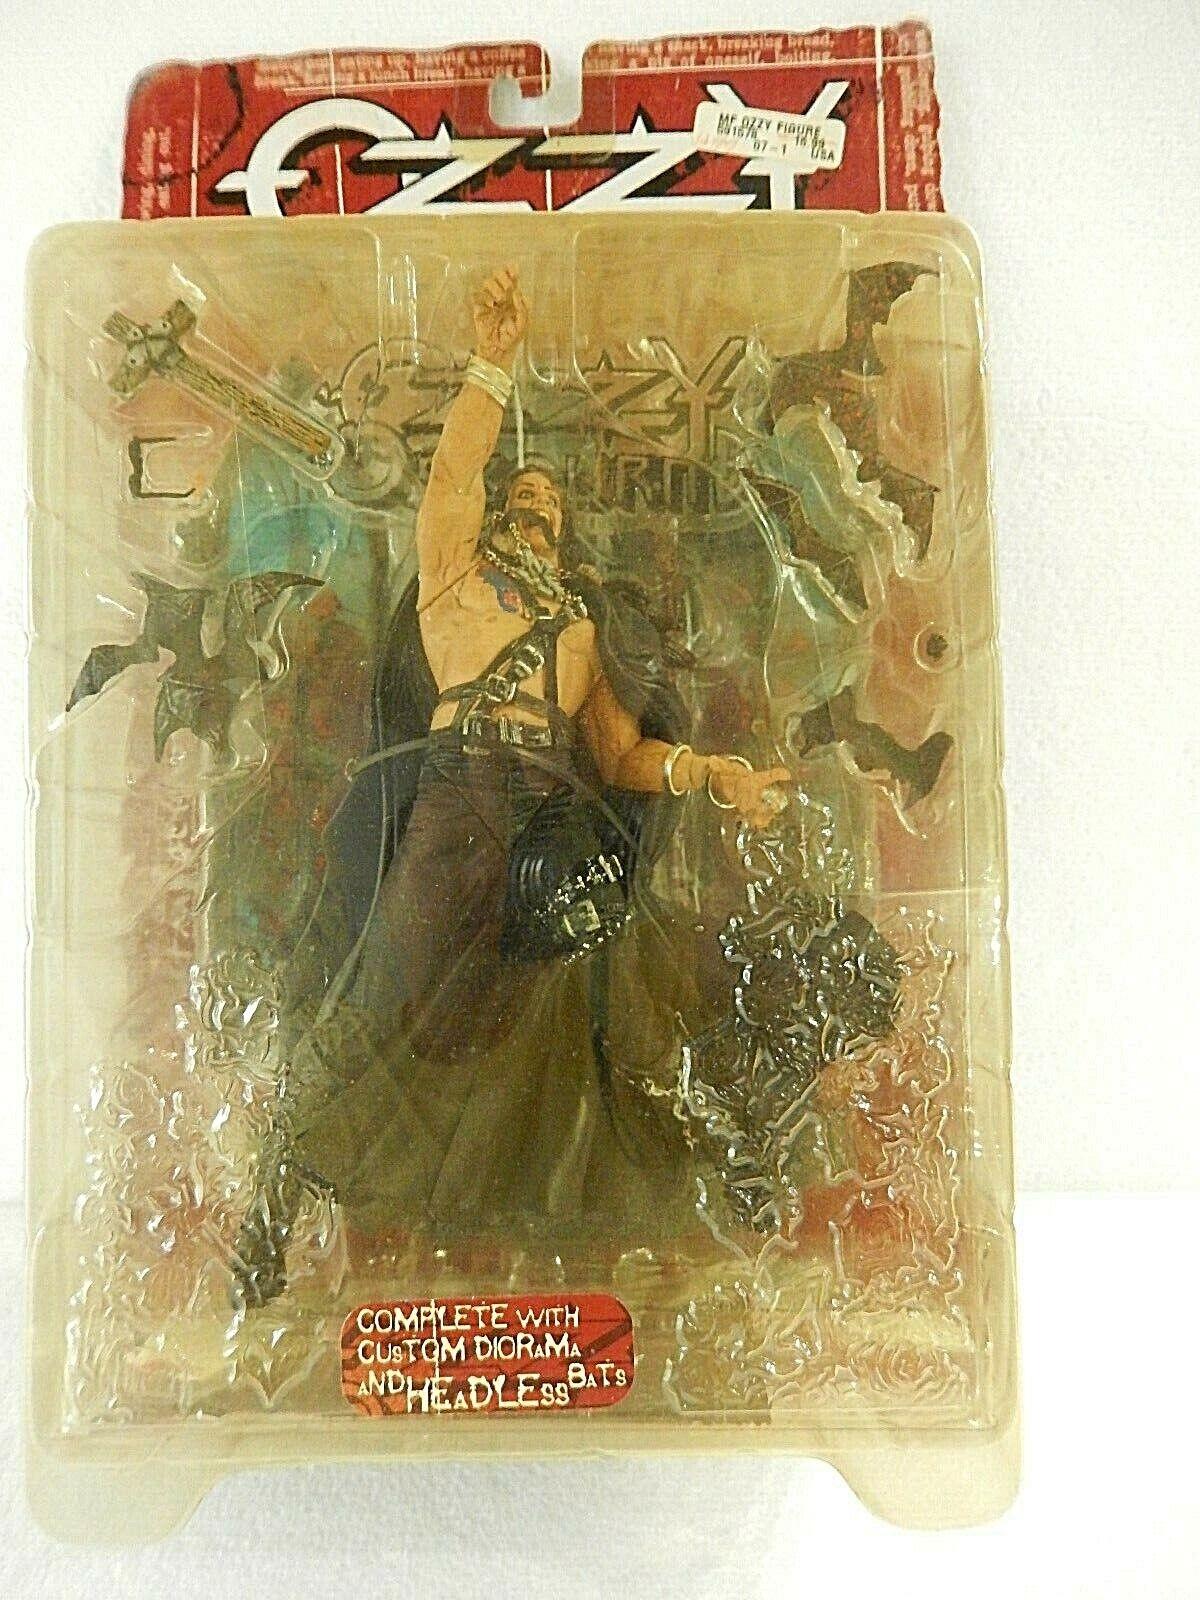 1999 McFarlane Toys Ozzy Osbourne Ultra-Action Figure w  Diorama Headless Bats